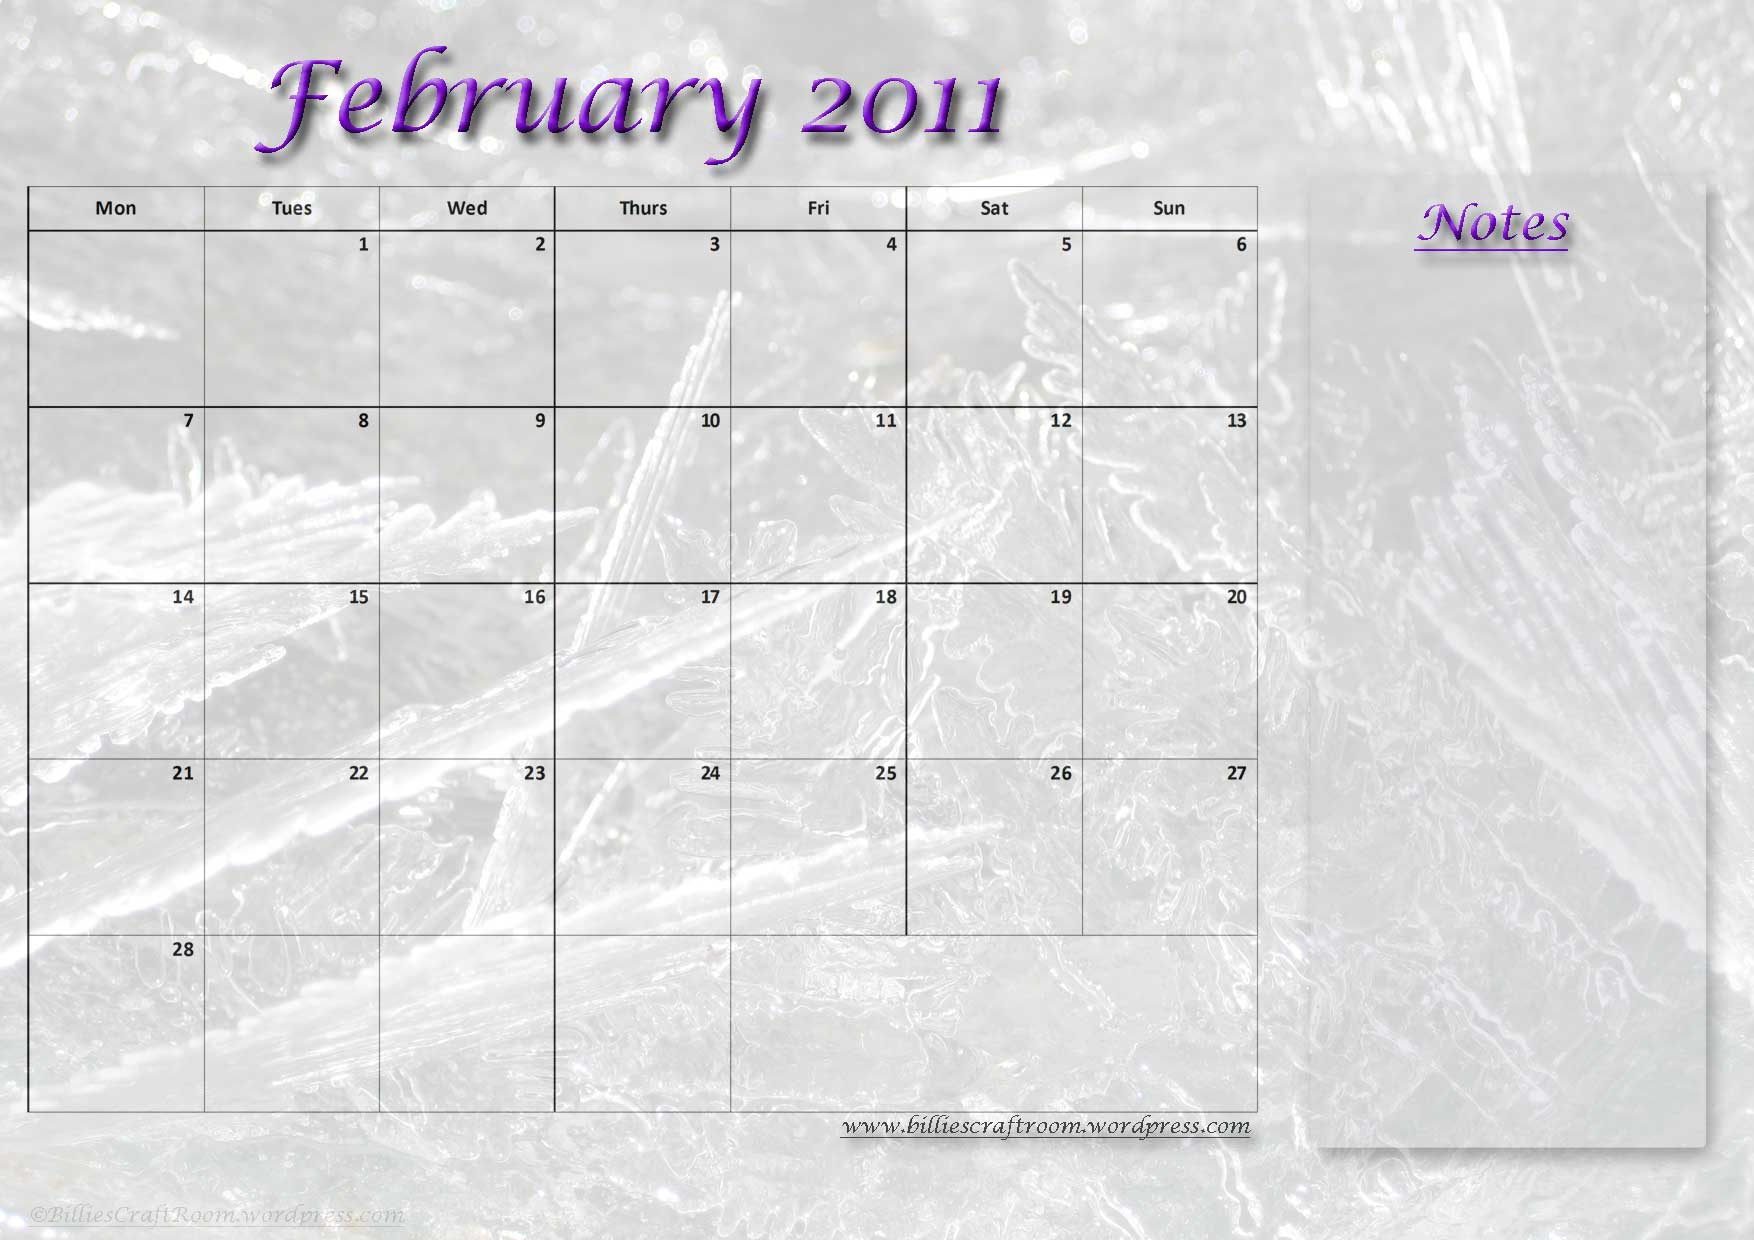 Calendar-February-2011